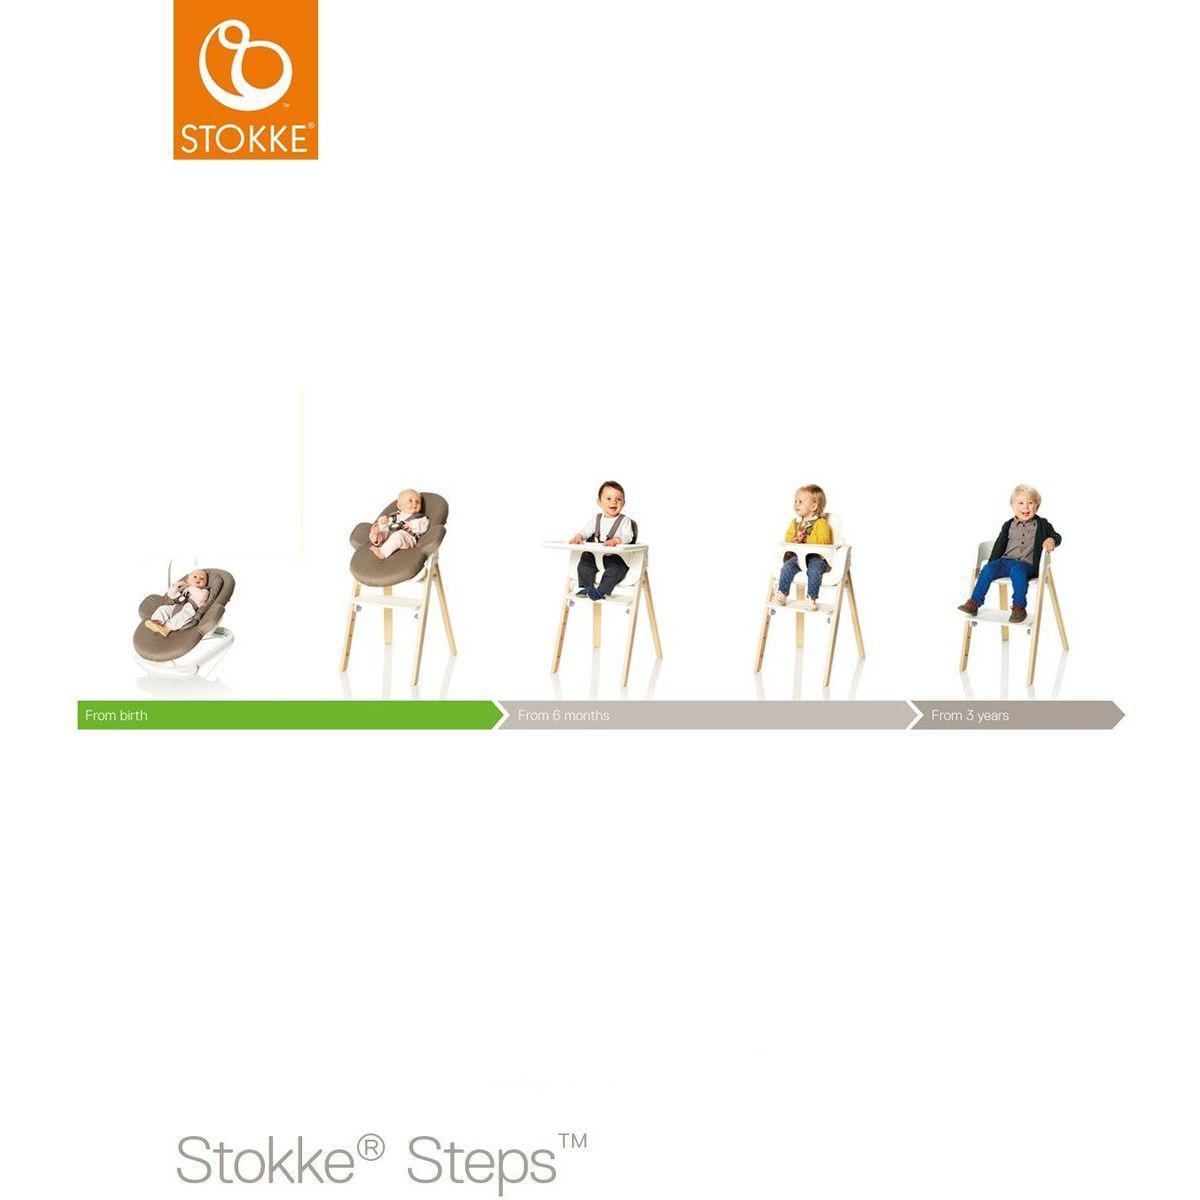 abitare pieds chaise haute h tre steps stokke. Black Bedroom Furniture Sets. Home Design Ideas